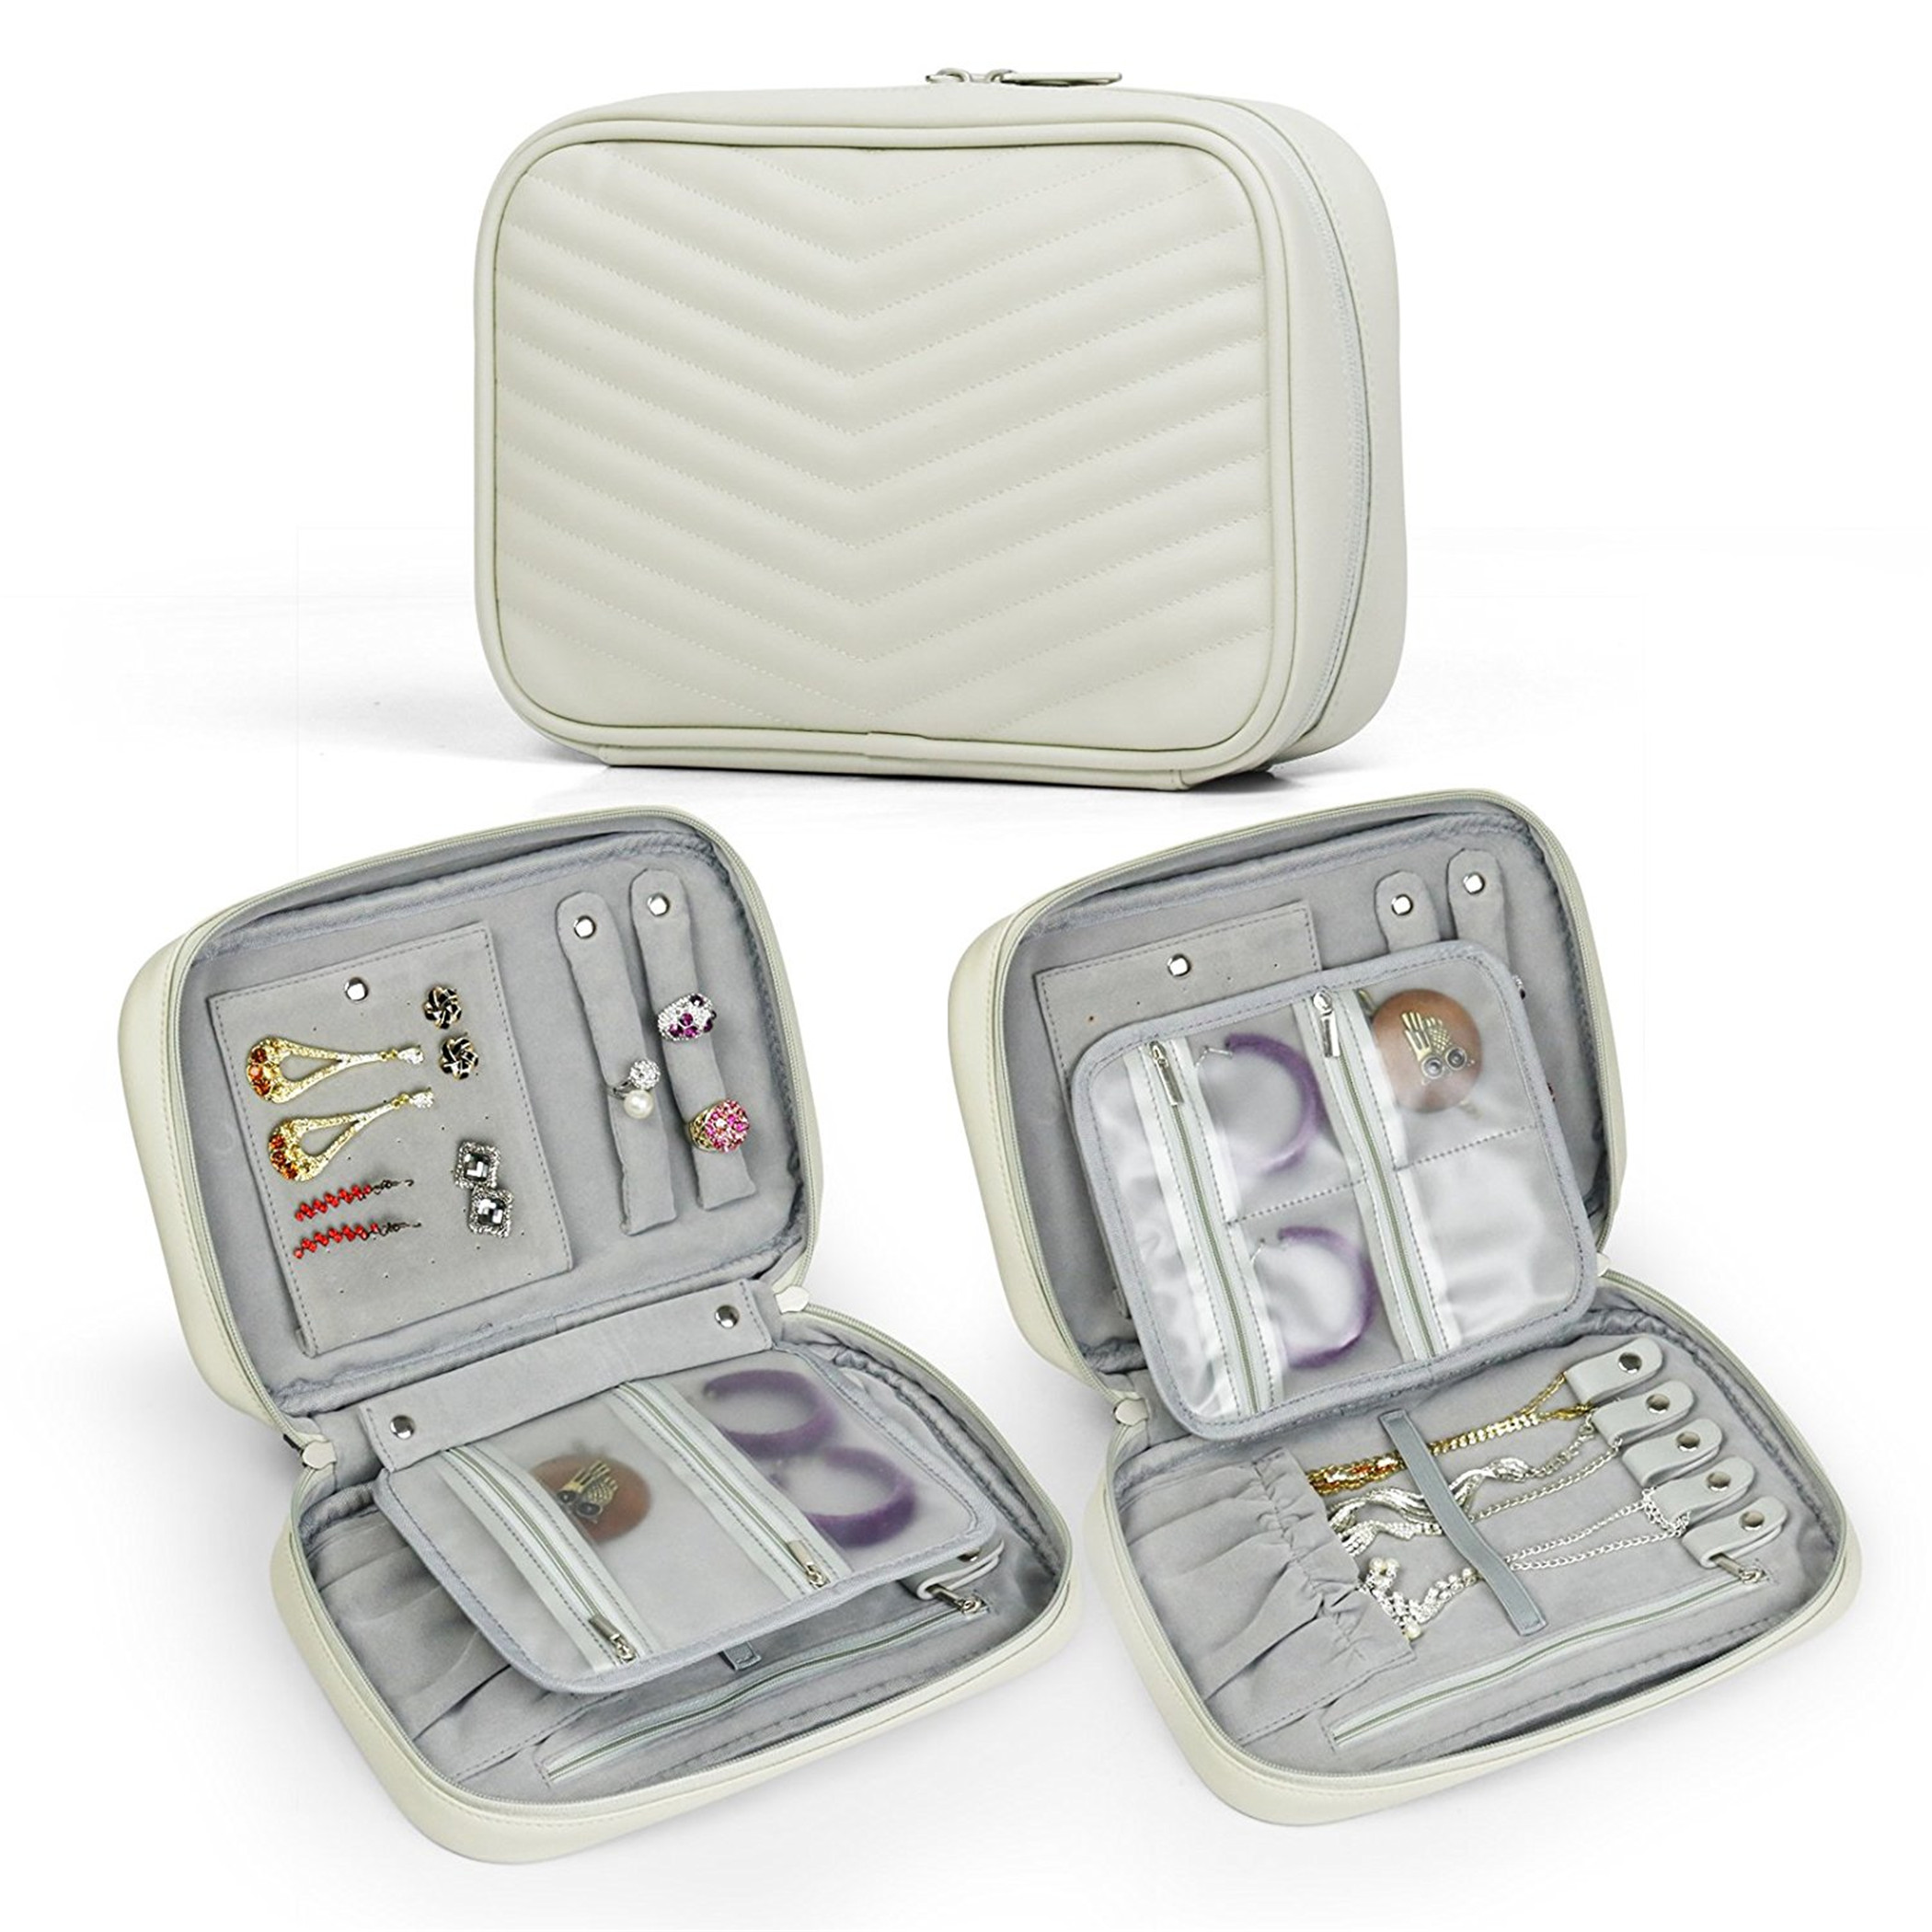 Becko Travel Jewelry Organizer Bag Case Roll Pouch (Creamy White) - Walmart.com